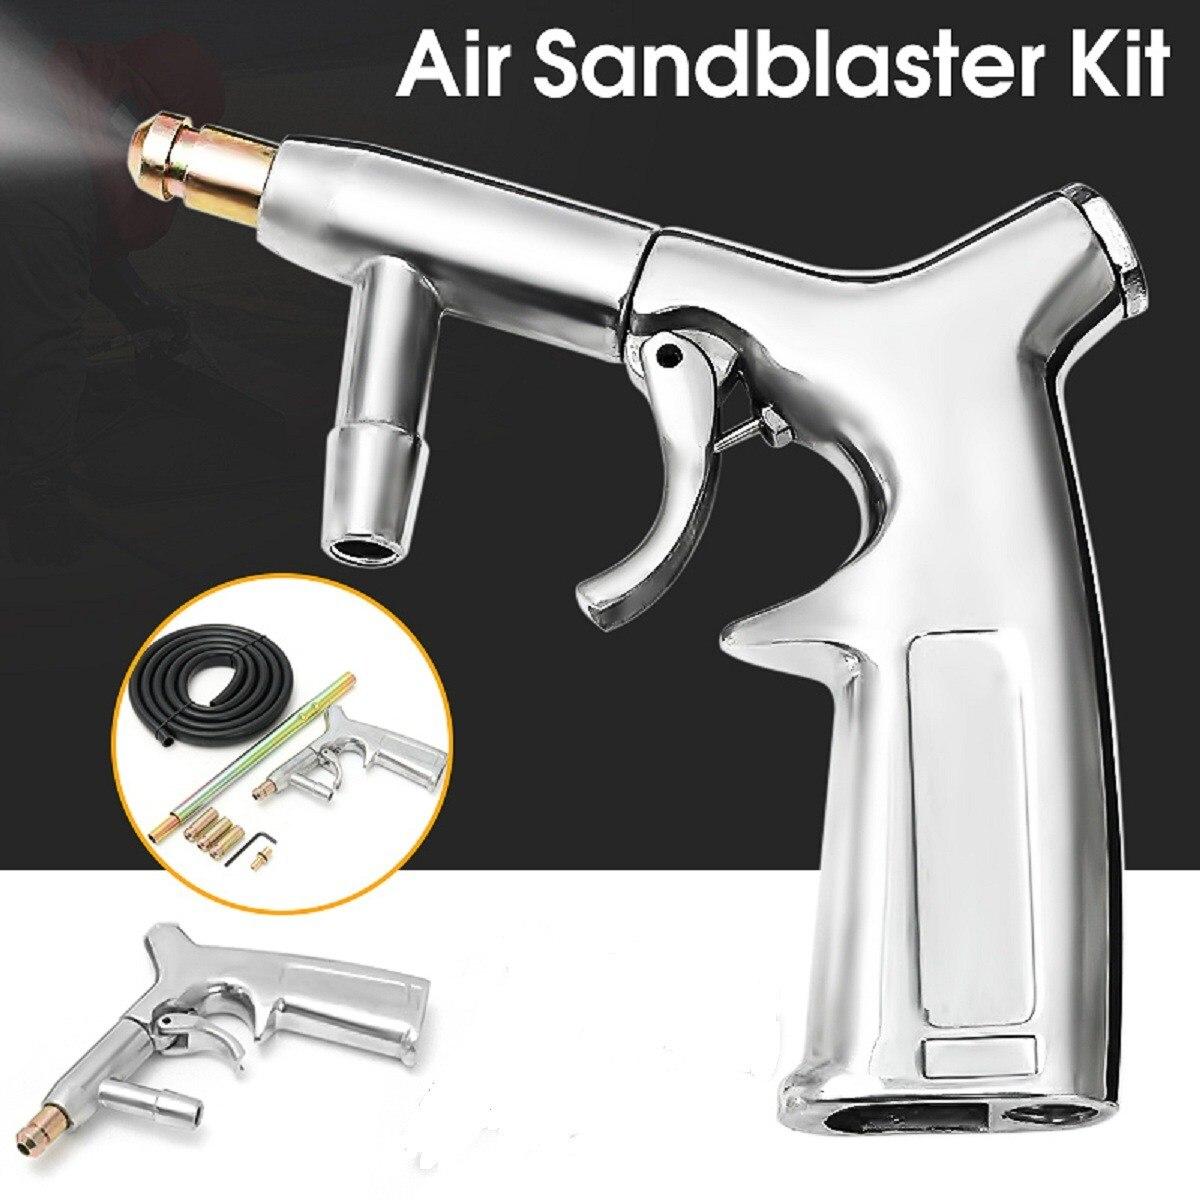 Air Sandstrahler Kit Sandstrahlen Gun Mit 1 4 Dusen Rohr Sand